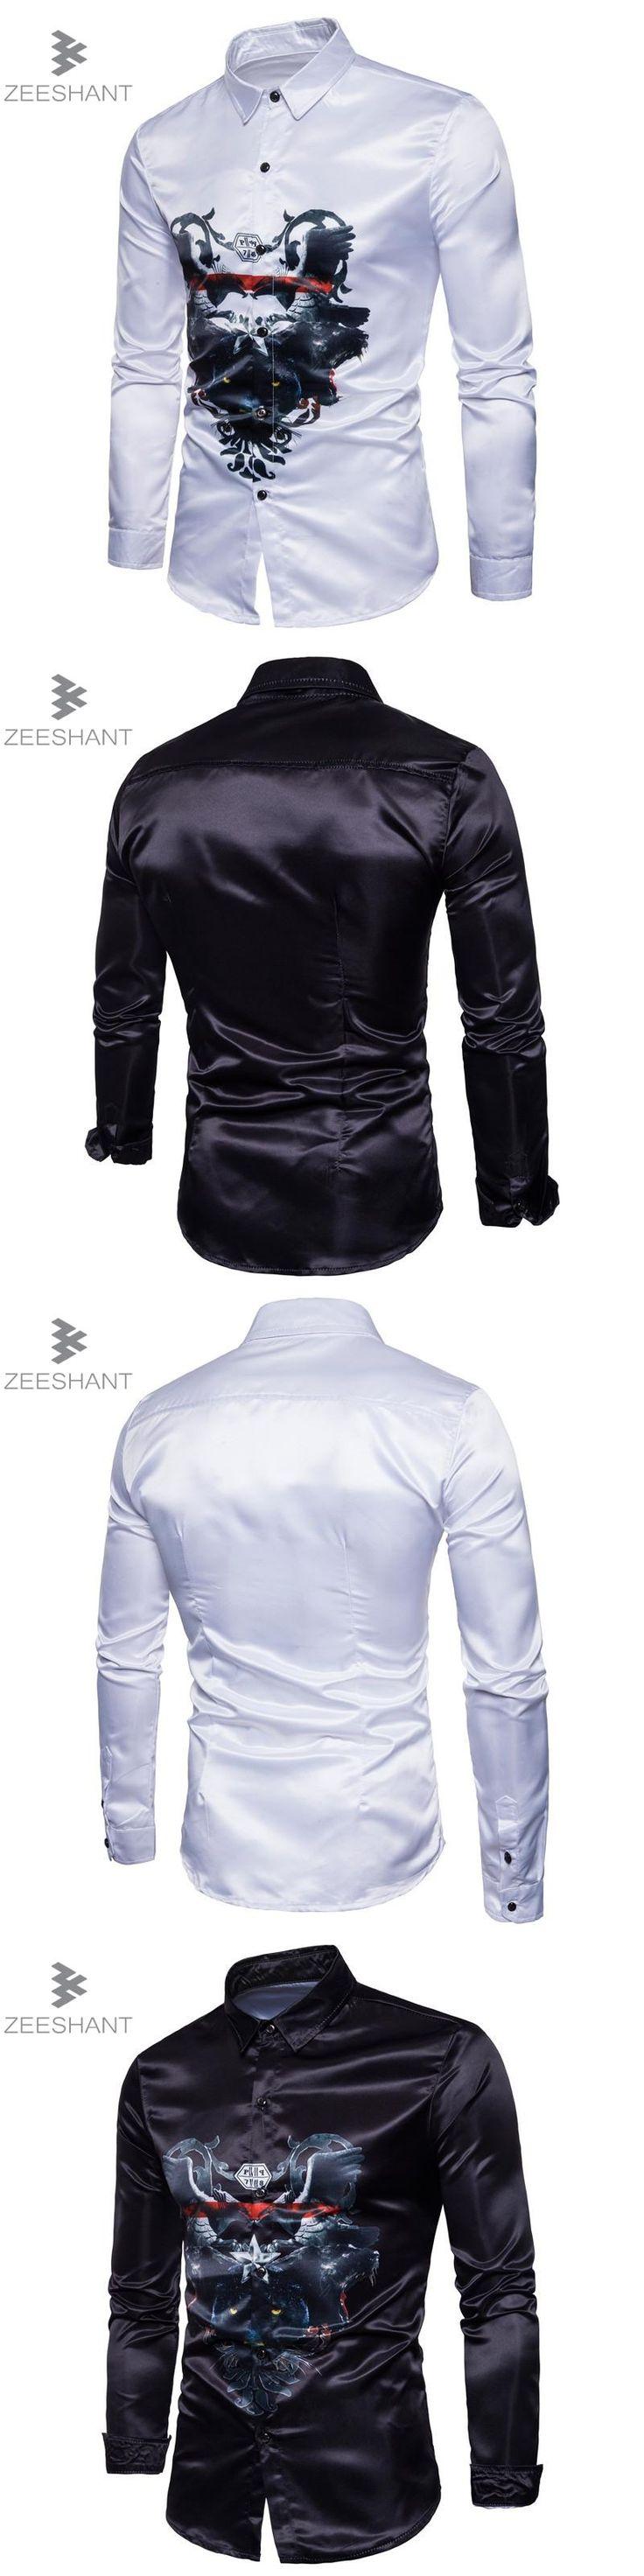 Zeeshant Tuxedo Shirts Classic  Shirt For Men Slim Fit Style Male Casual Mens Long Sleeve Designer in Men's Tuxedo Shirts XXL